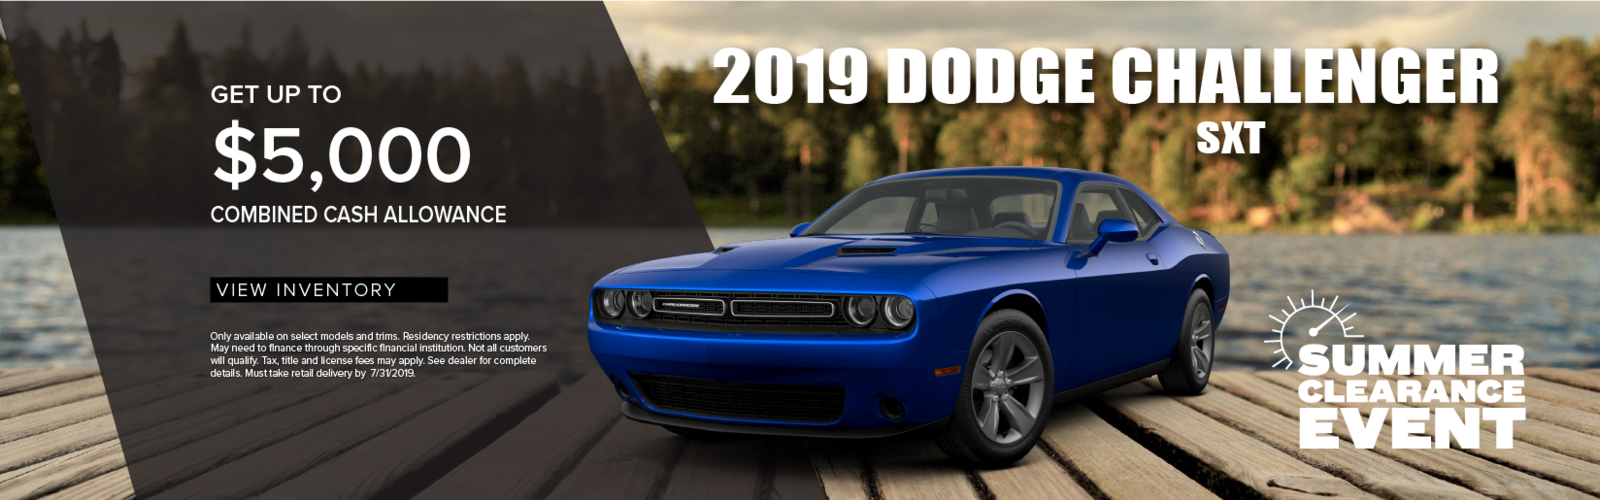 Dodge Dealership Dothan Al >> Bob Pforte Motors Marianna Fl Chrysler Dodge Jeep Ram